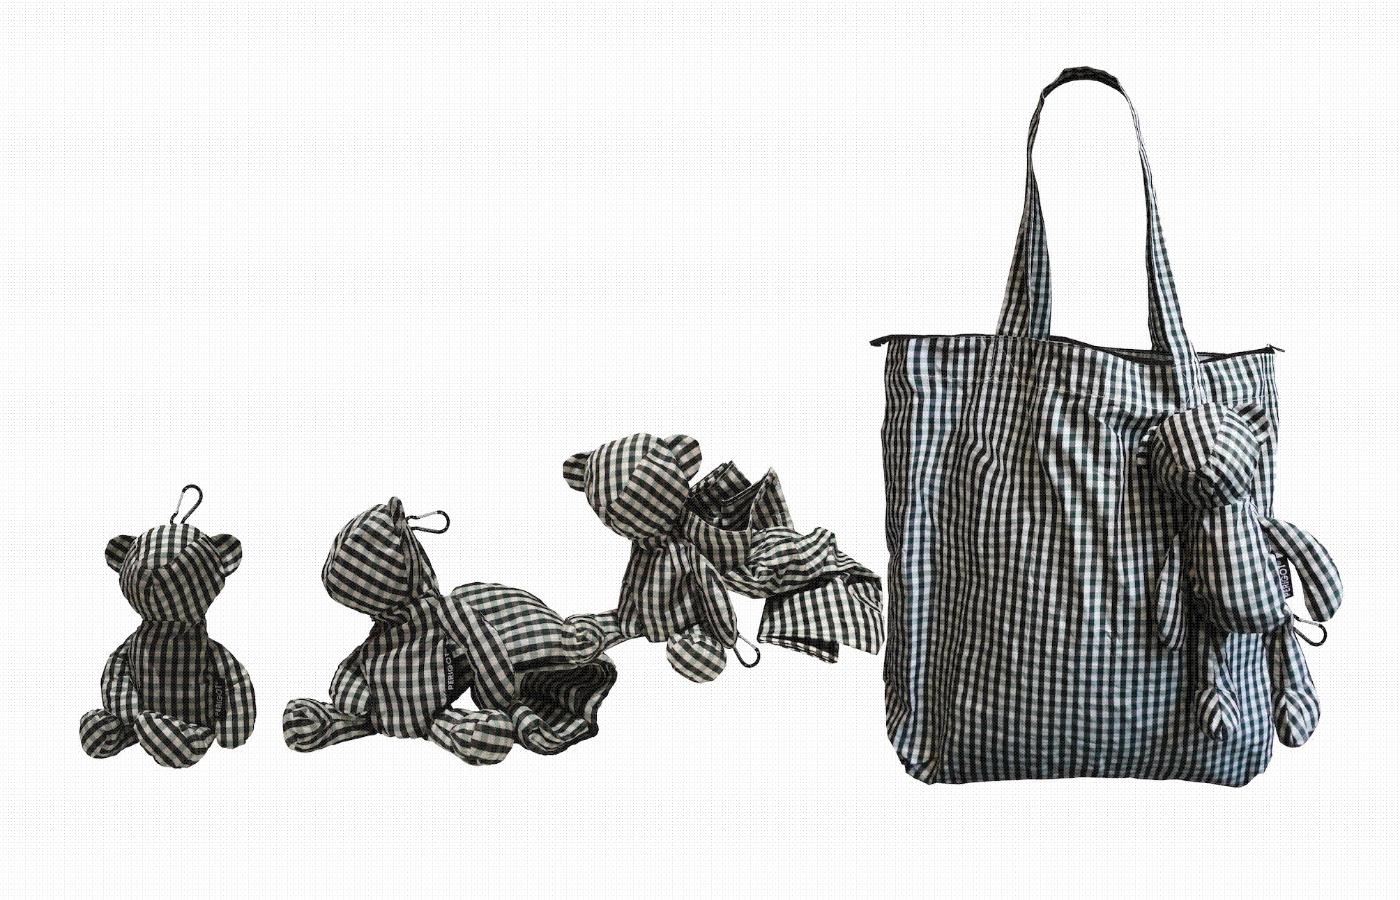 61d49cd6c03 PERIGOT - The Original Bear Bag Shopper in Vichy Blue Bear size  Small  15cm